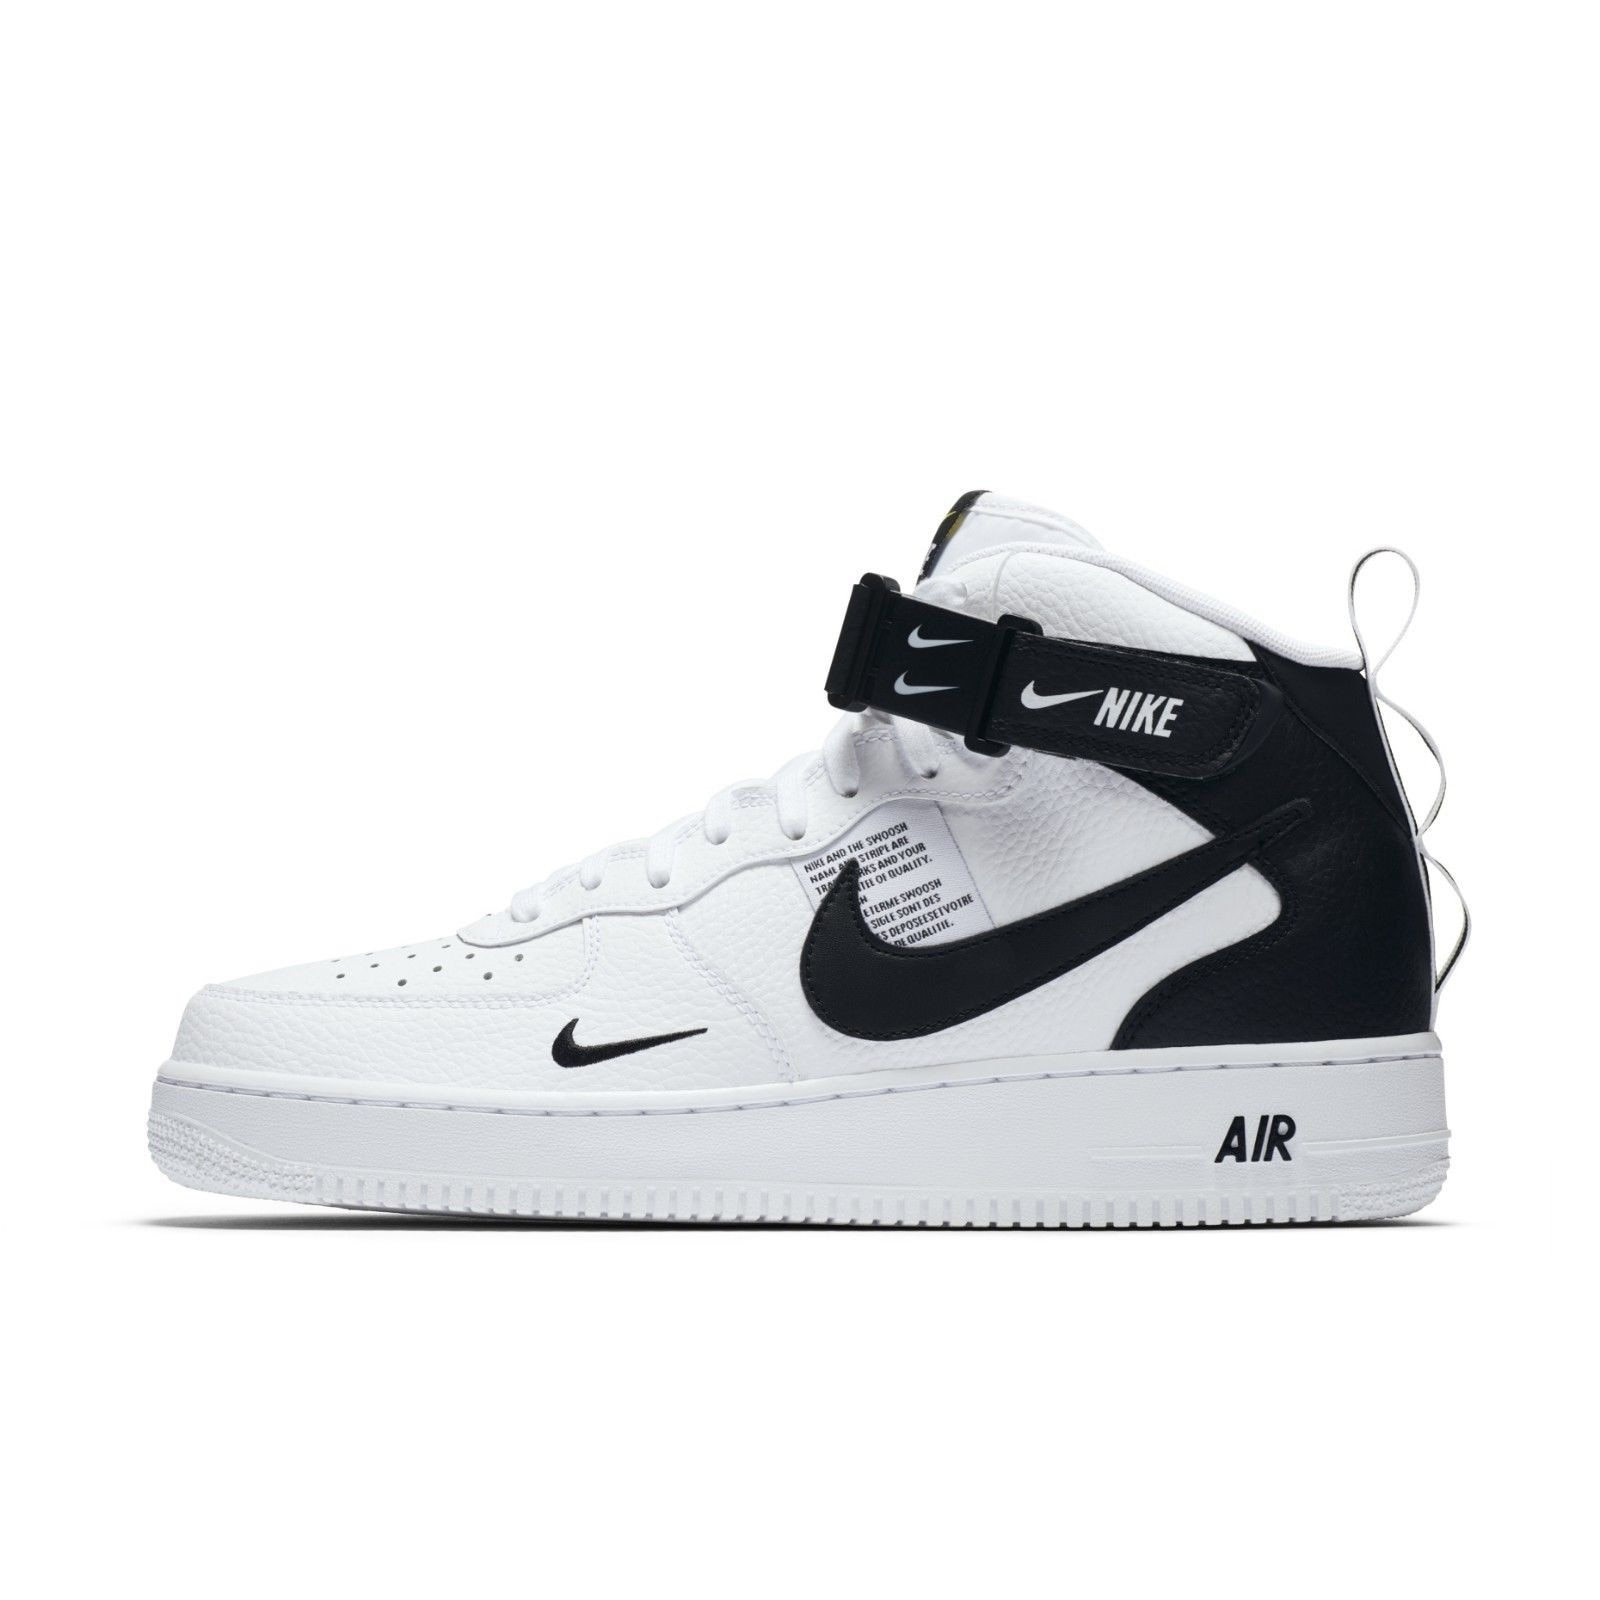 Arancel Plantación Negligencia médica  Pantofi sport,Nike Air Force 1 MID `07 LV8 804609-103,Alb/Negru 43 EU -  eMAG.ro